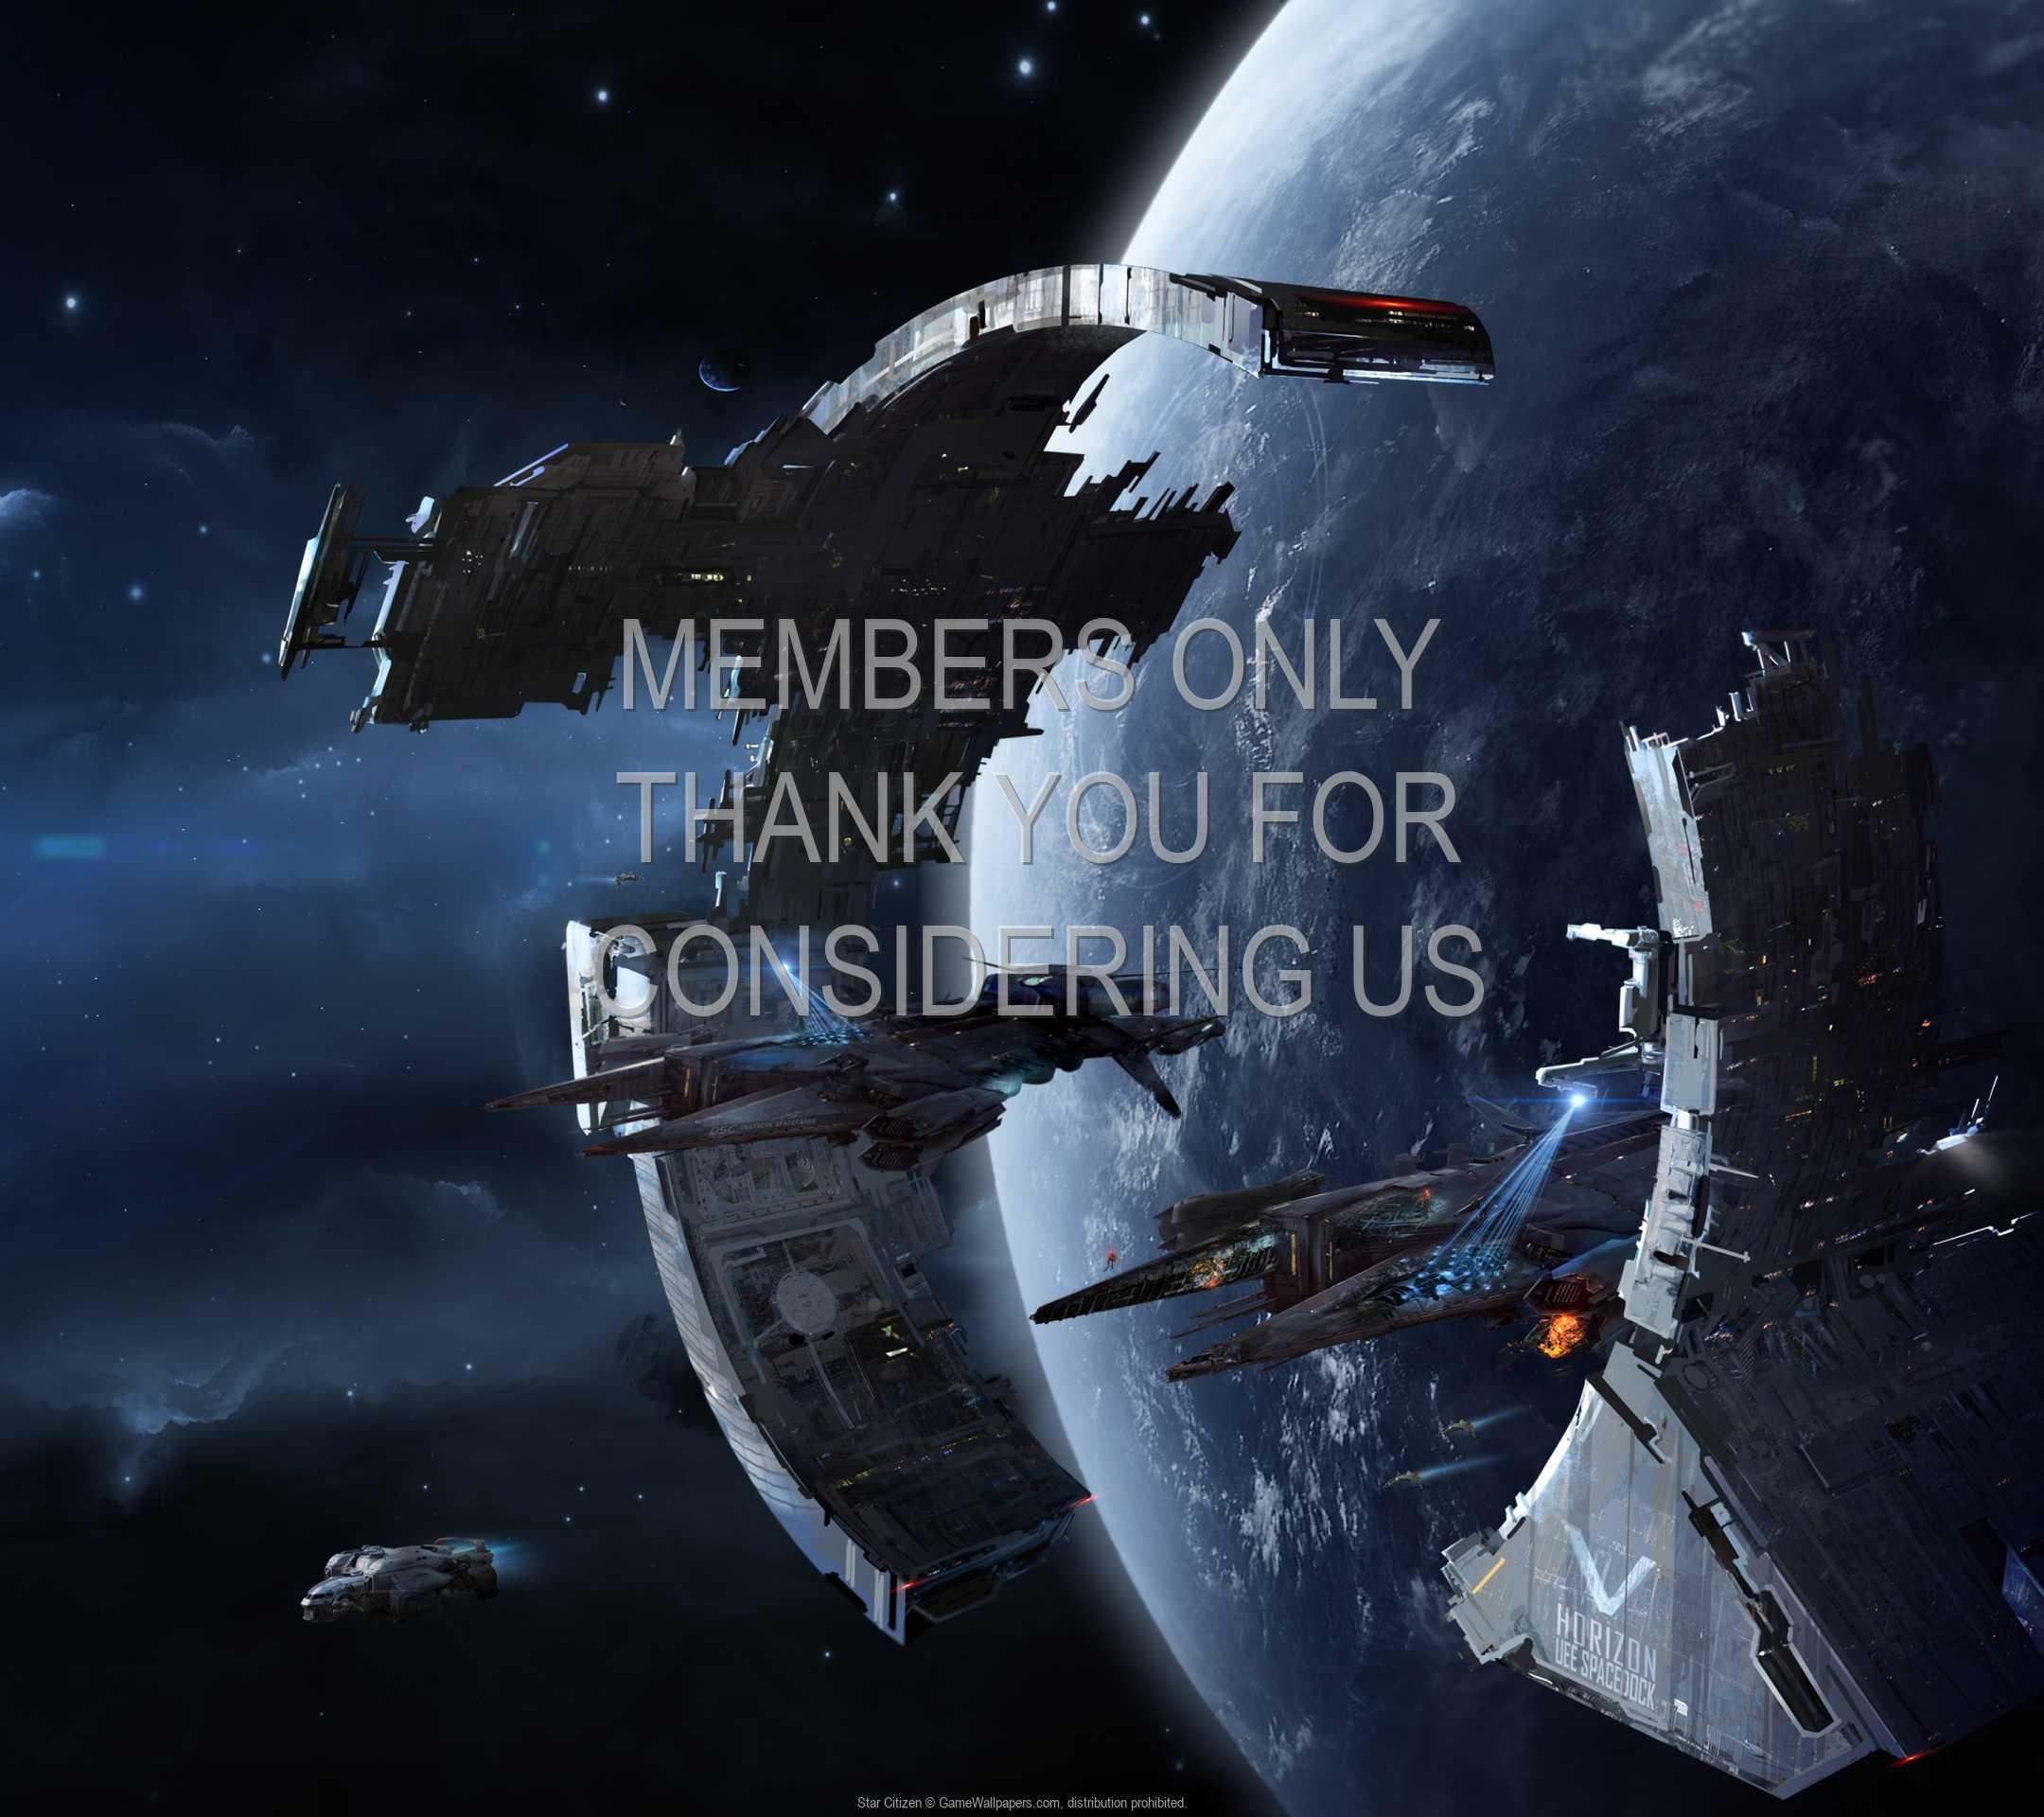 Star Citizen 1080p Horizontal Mobile wallpaper or background 51